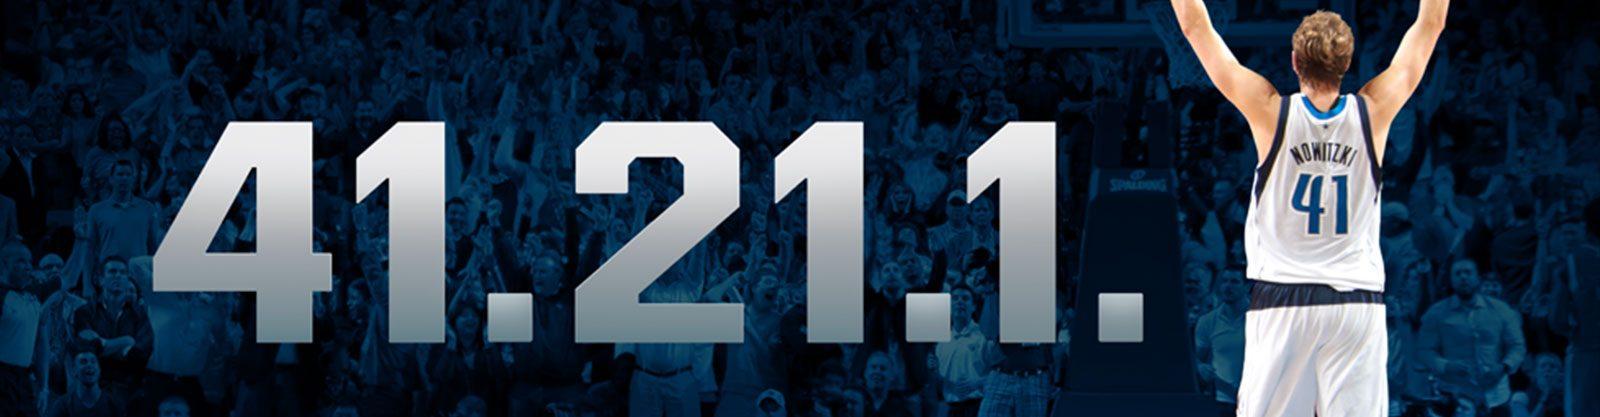 ae94a630601 Dallas Mavericks Commemorates Dirk Nowitzki s Retirement with AR Fan  Engagement